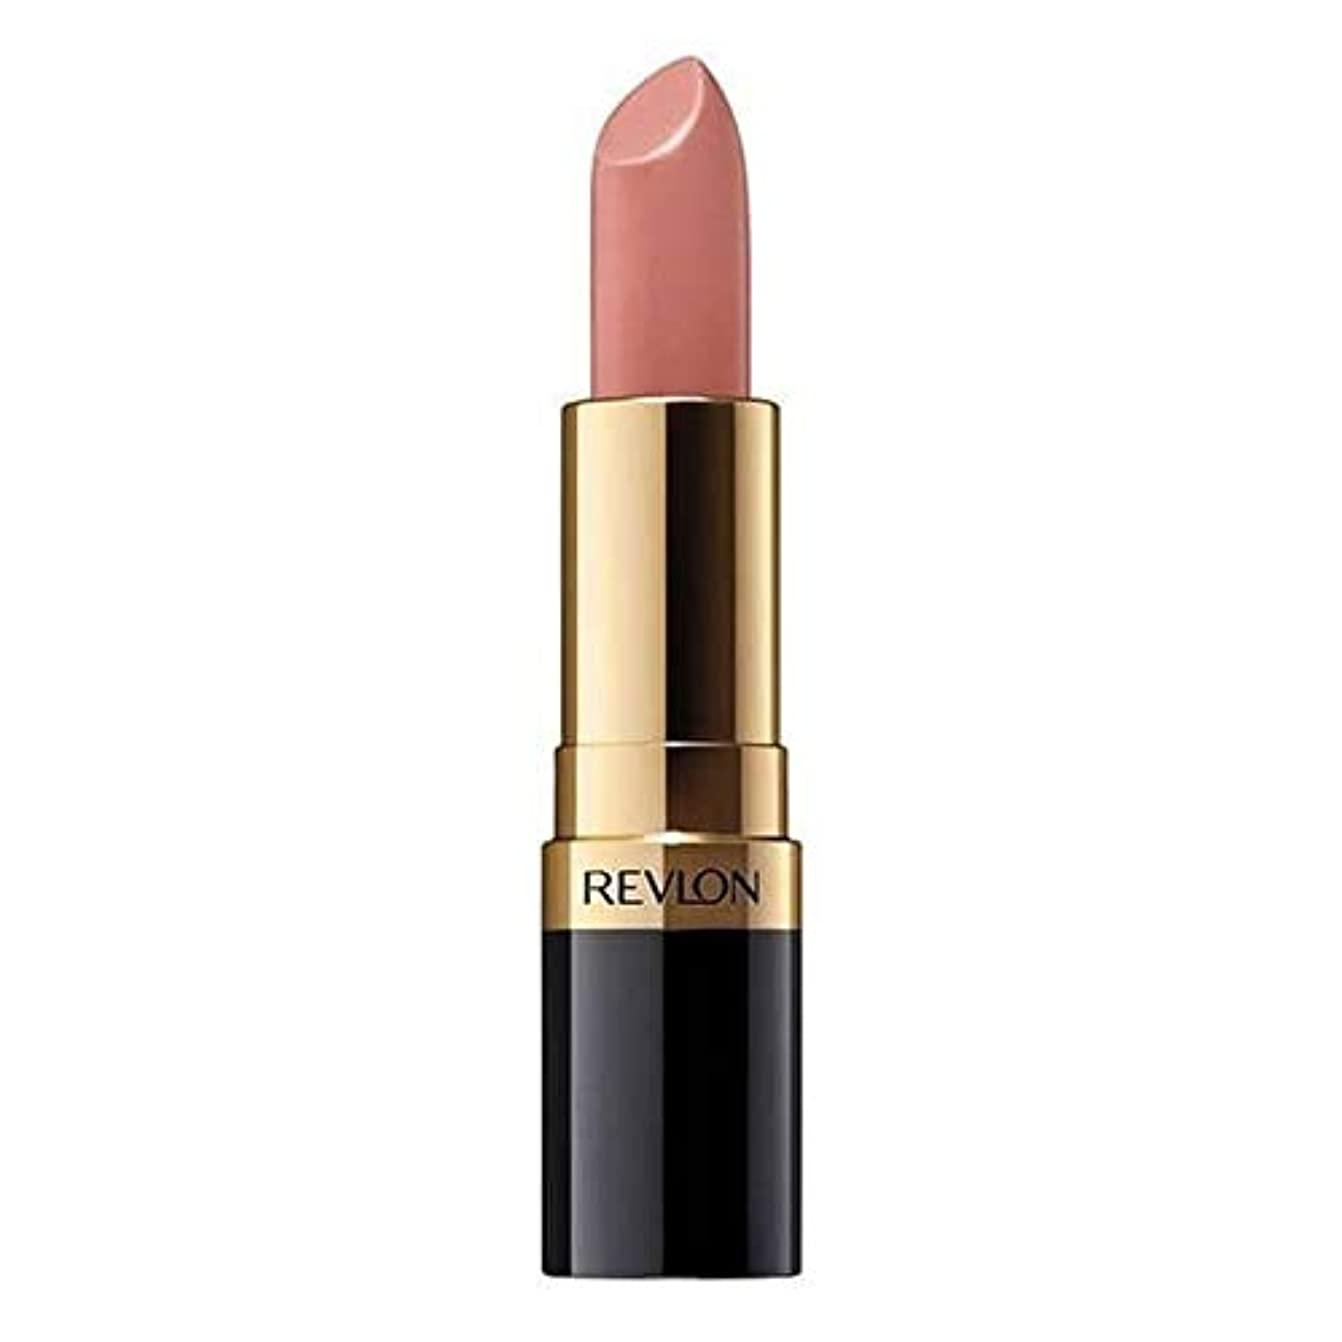 [Revlon ] レブロンSuperlustrous口紅裸事件 - Revlon SuperLustrous Lipstick Bare Affair [並行輸入品]